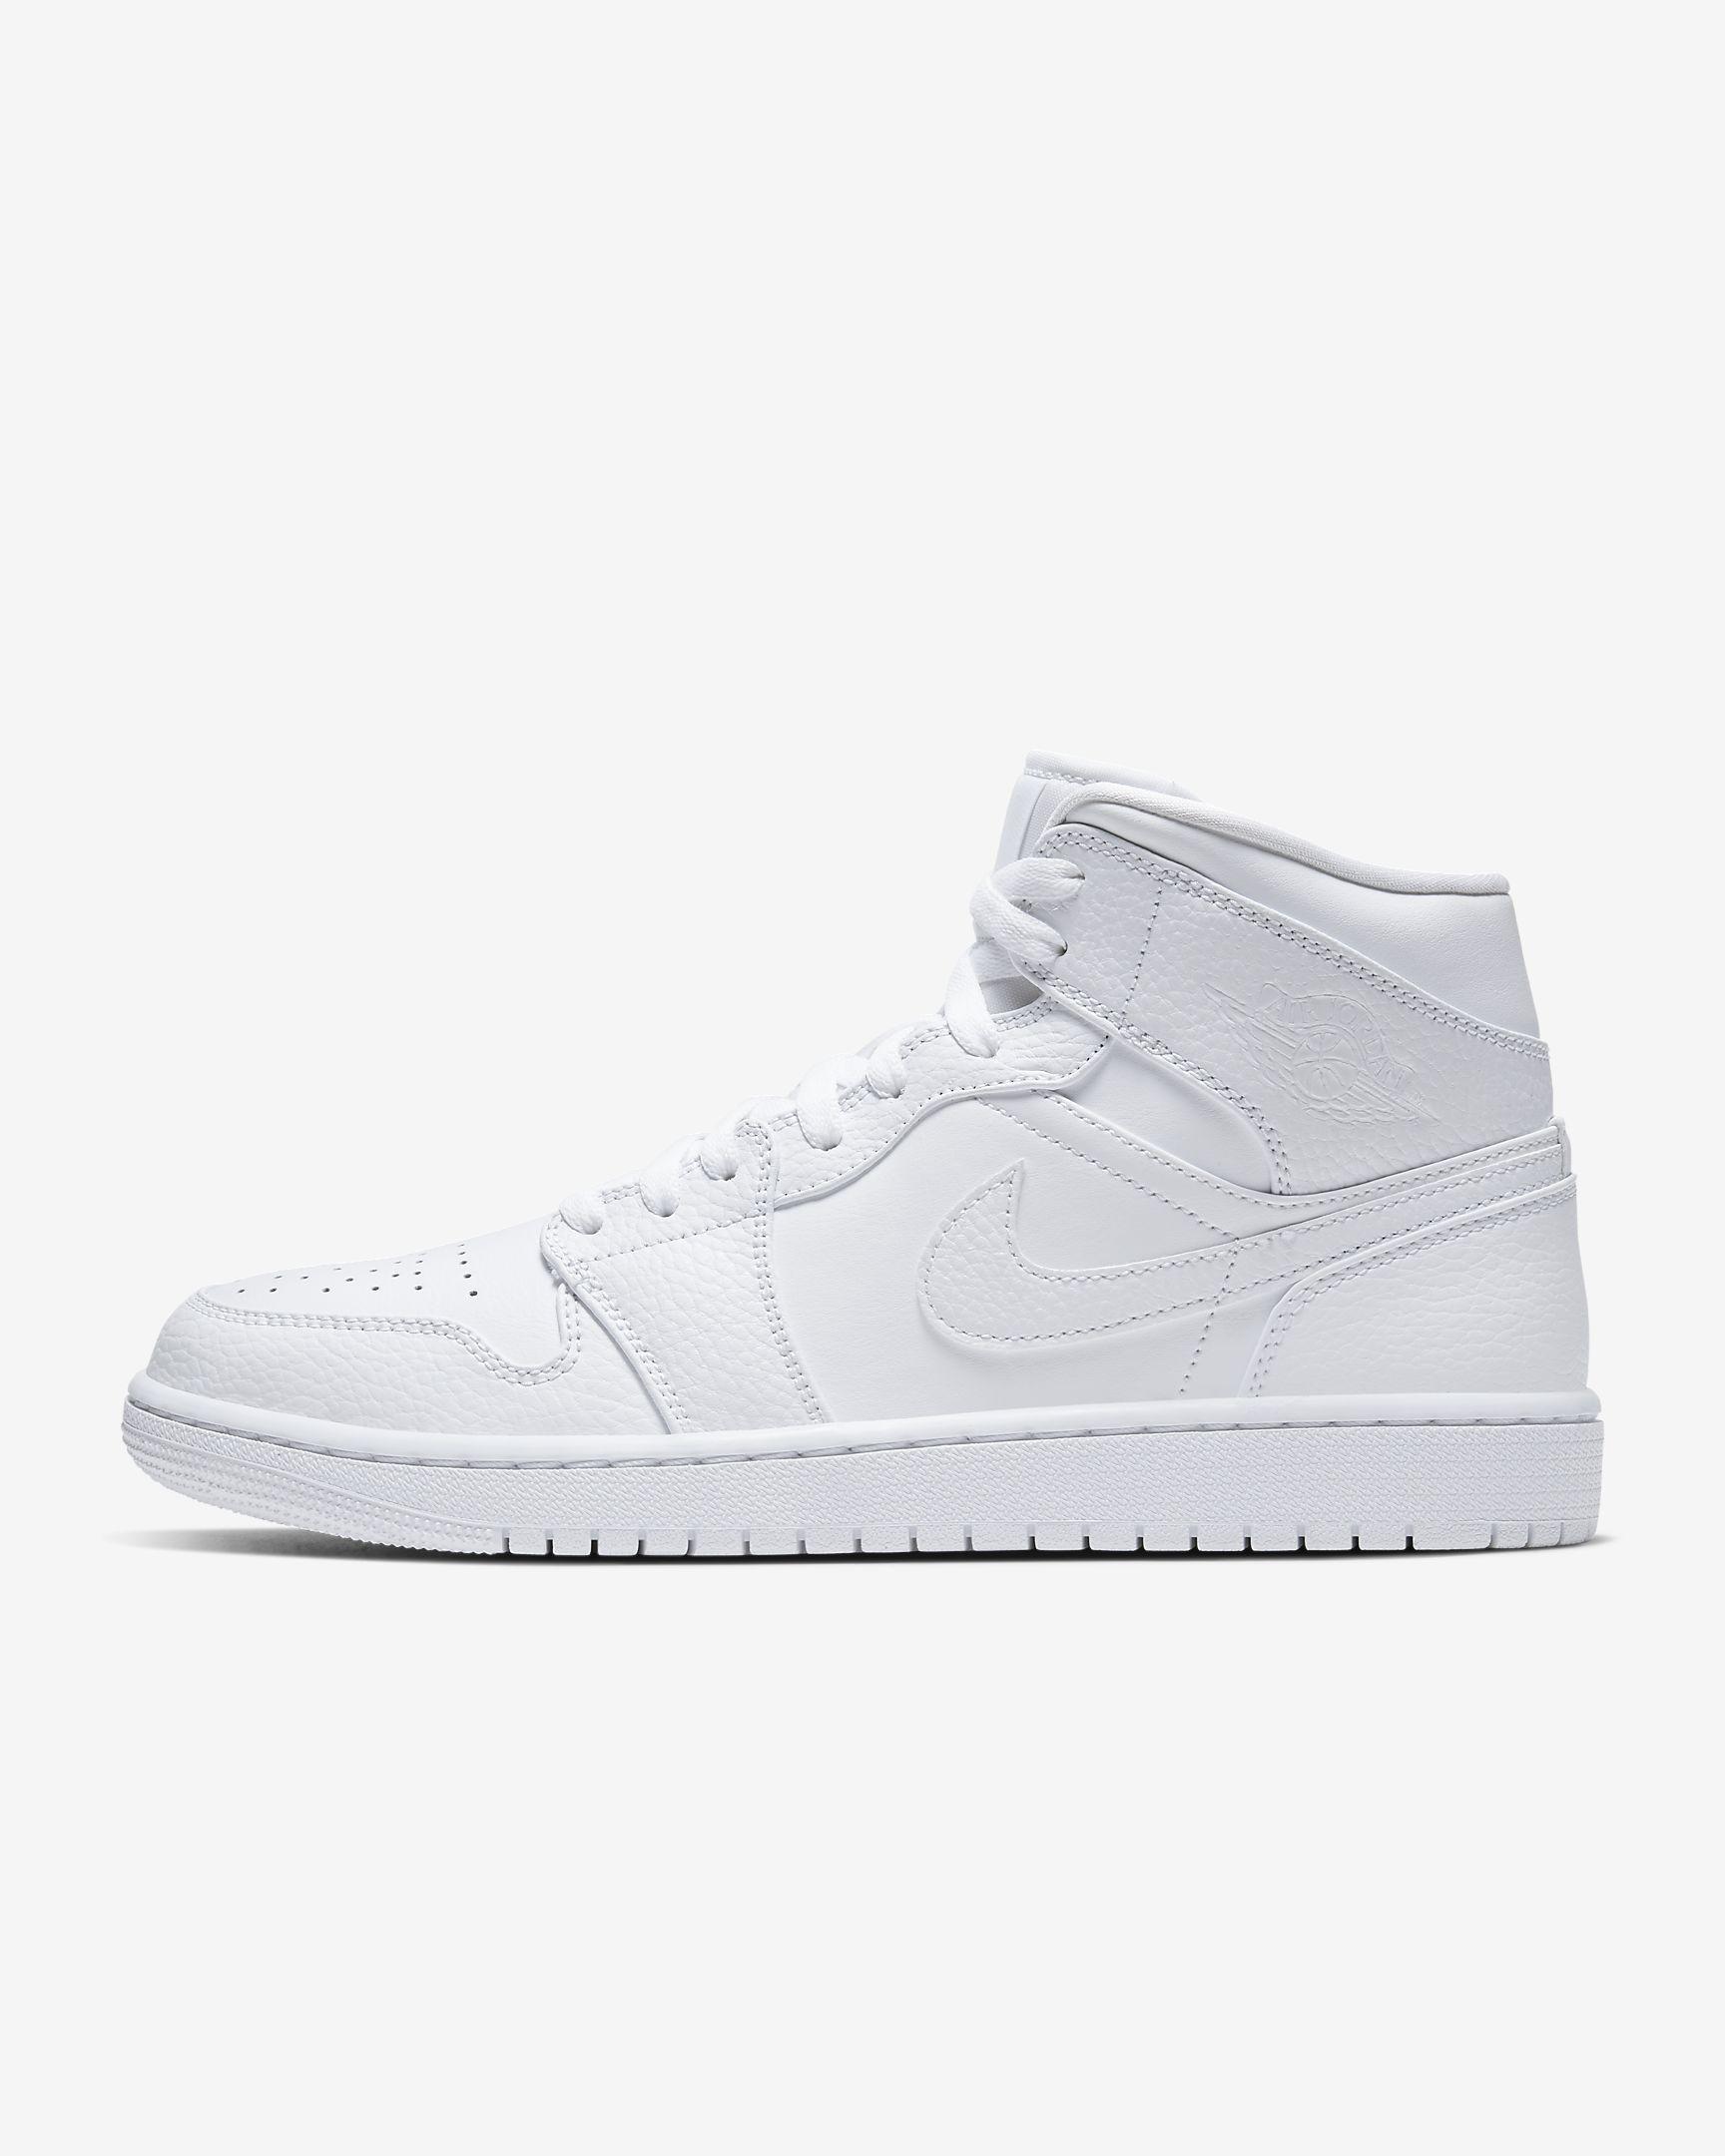 Nike Air Jordan 1 Mid in white